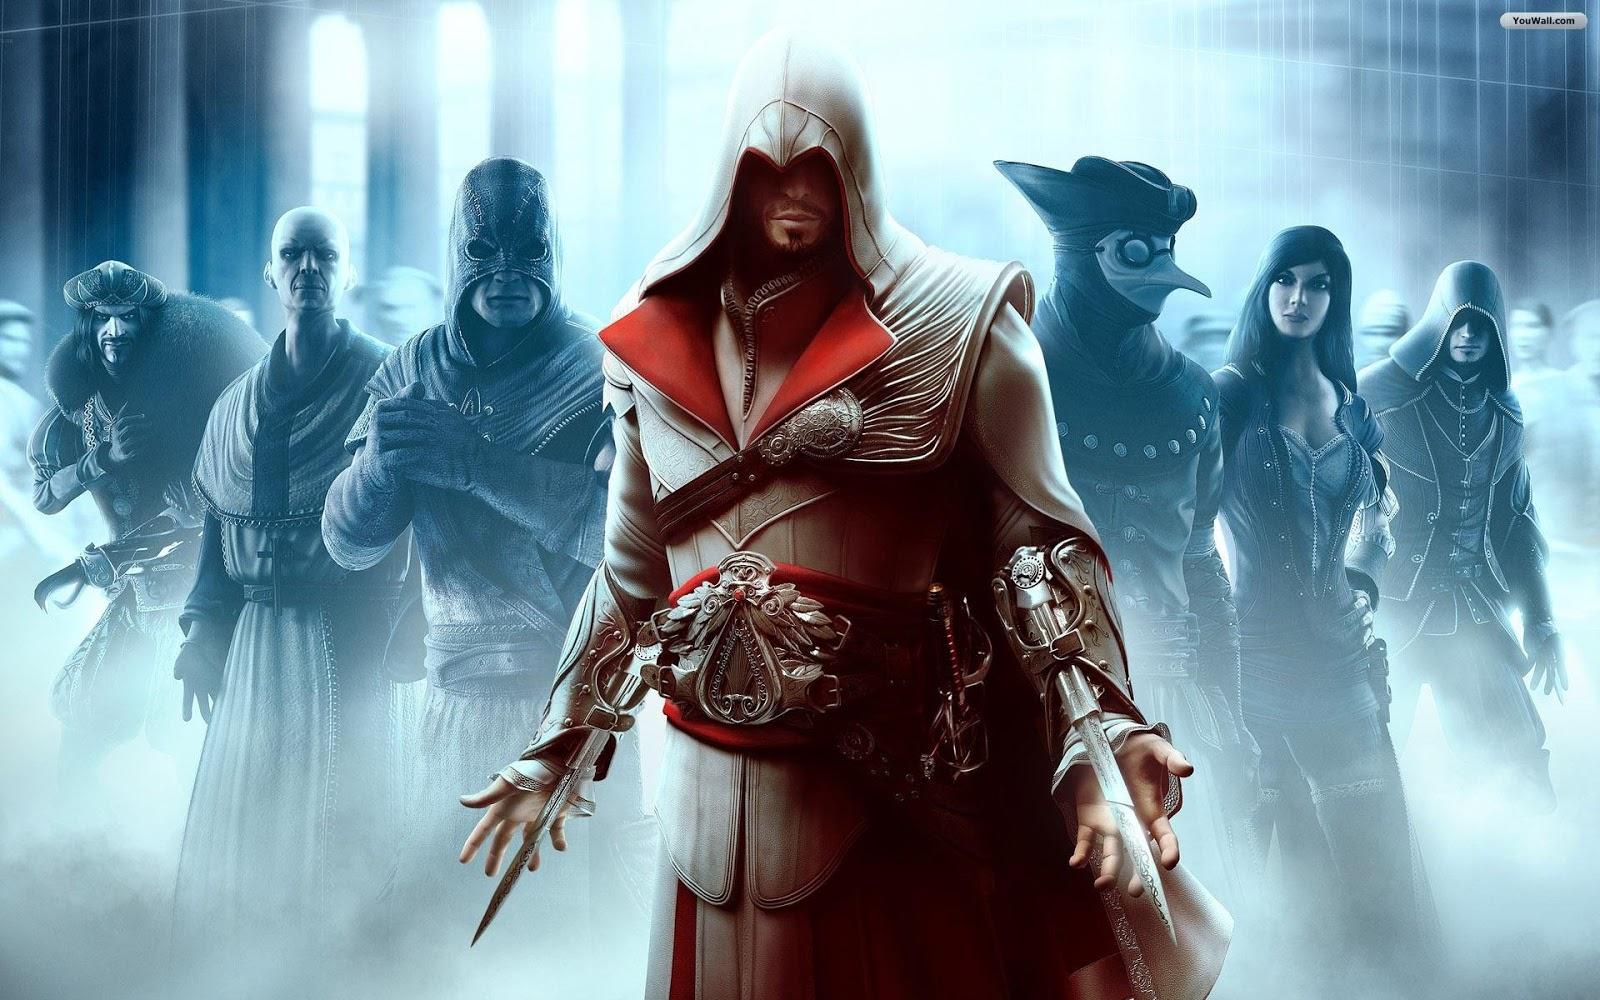 Wallpapers Hd Assassins Creed Brotherhood Wallpaper 4